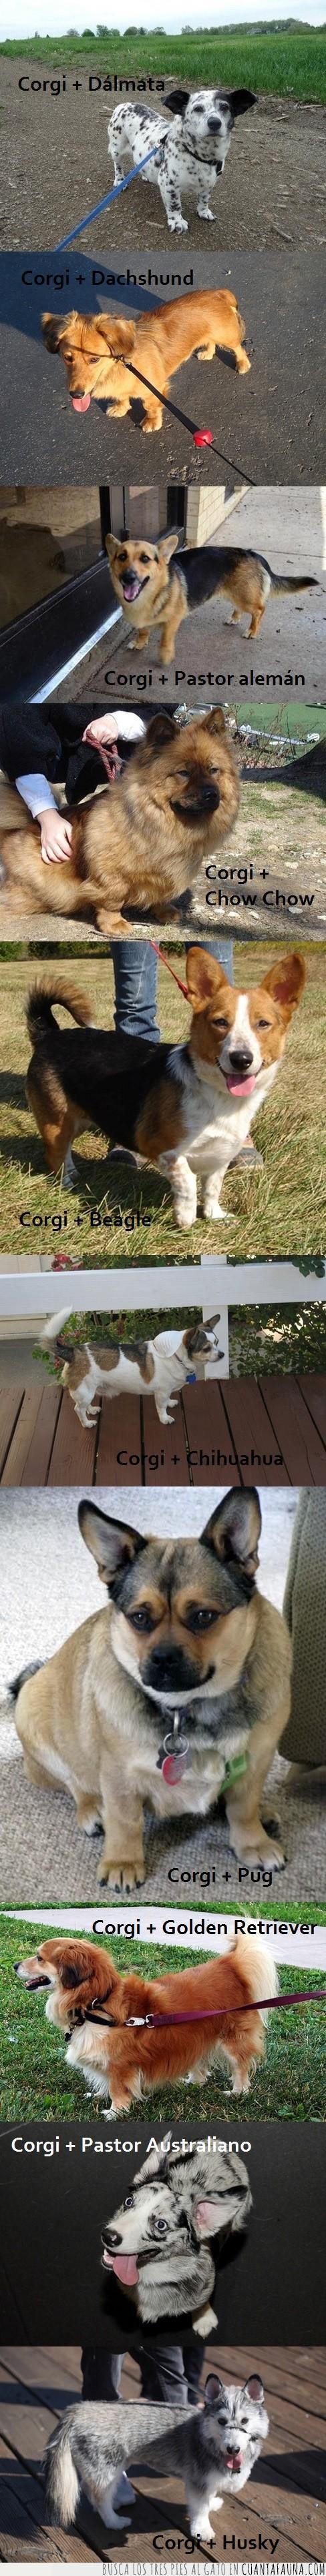 beagle,chihuahua,chow chow,corgi,cruce,dachshund,dálmata,golden retriever,híbrido,husky,mixto,pastor alemán,pastor australiano,perro,pug